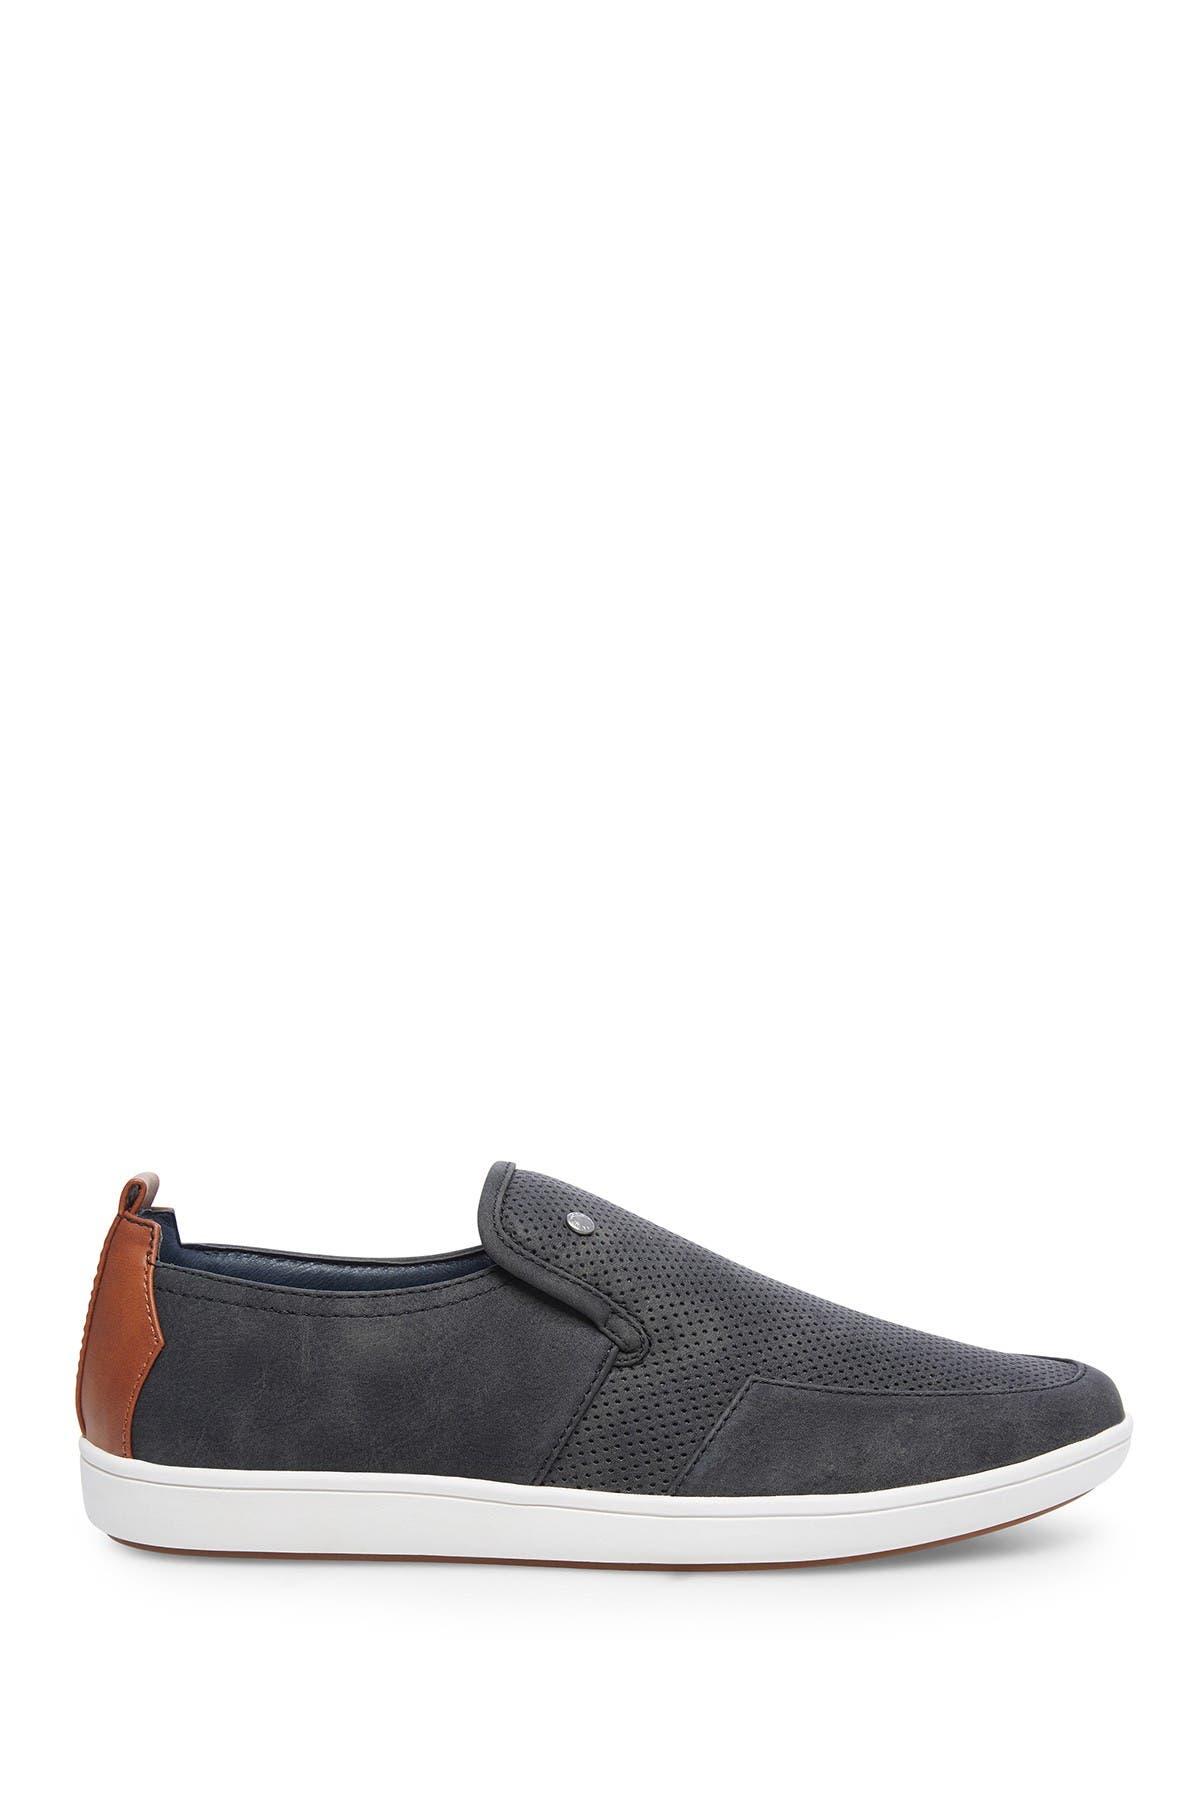 Image of Madden Fresin Perforated Slip-On Sneaker